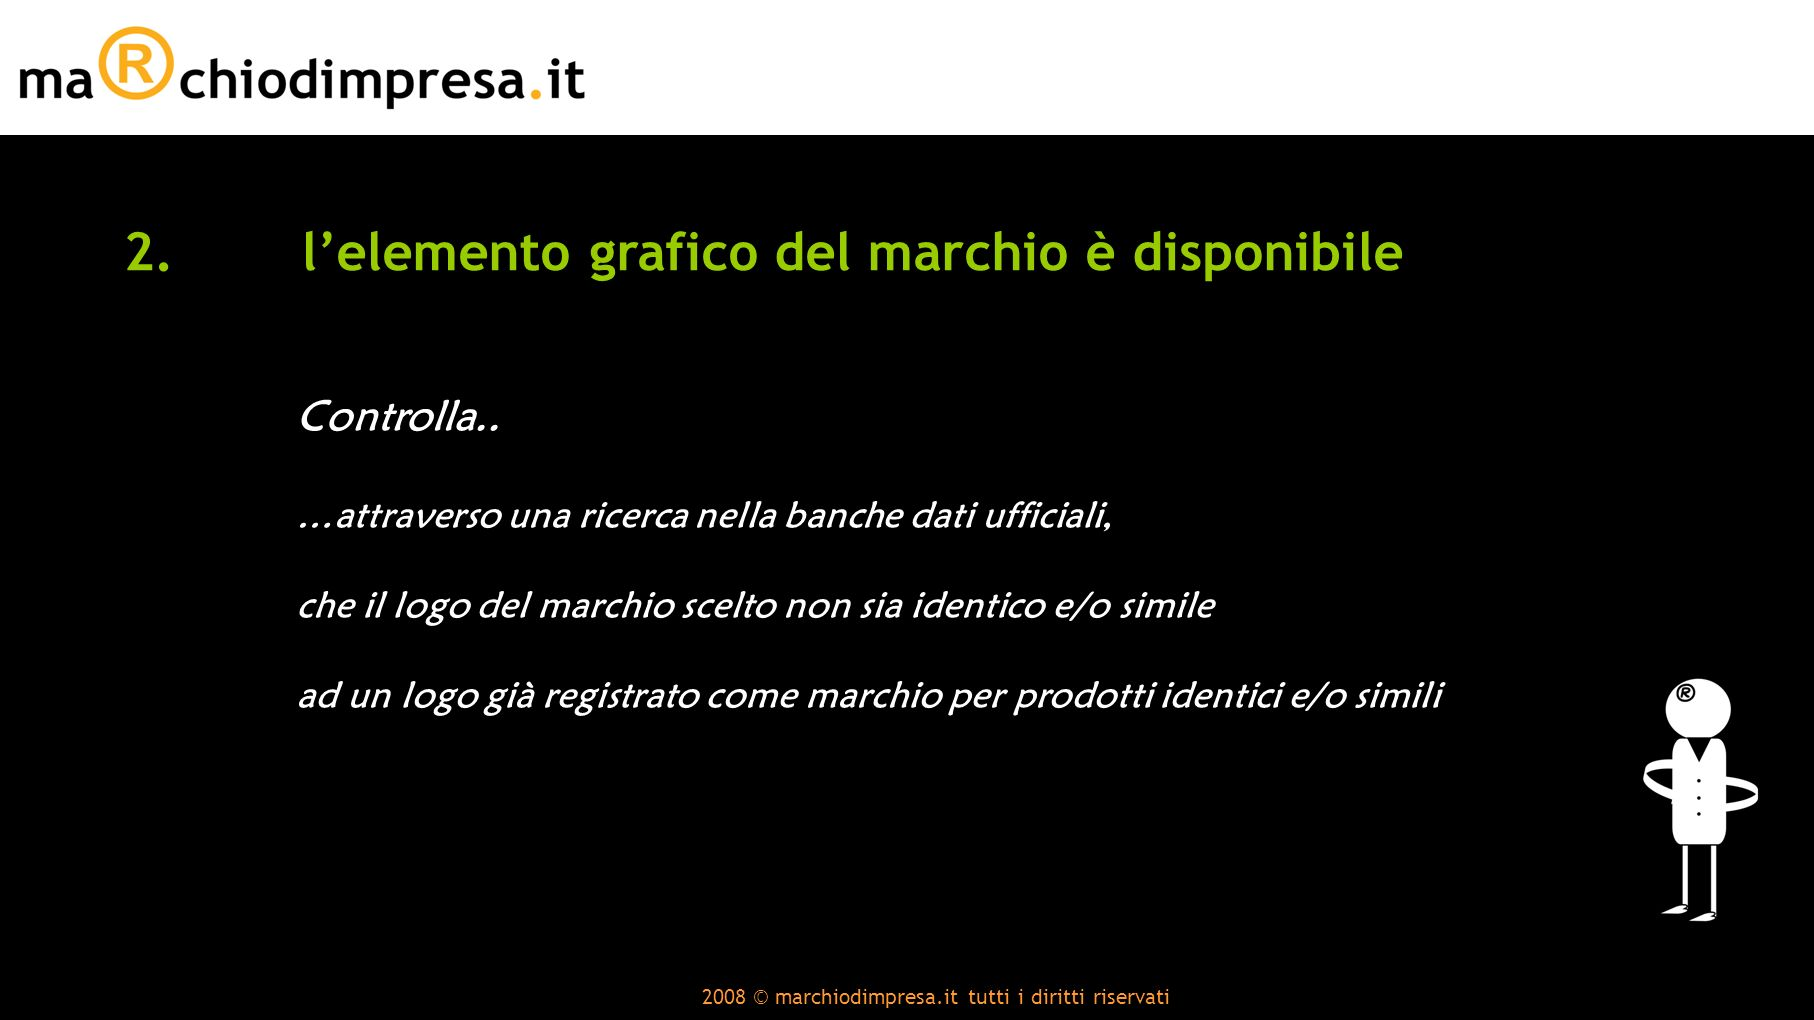 2008 © marchiodimpresa.it tutti i diritti riservati 2.